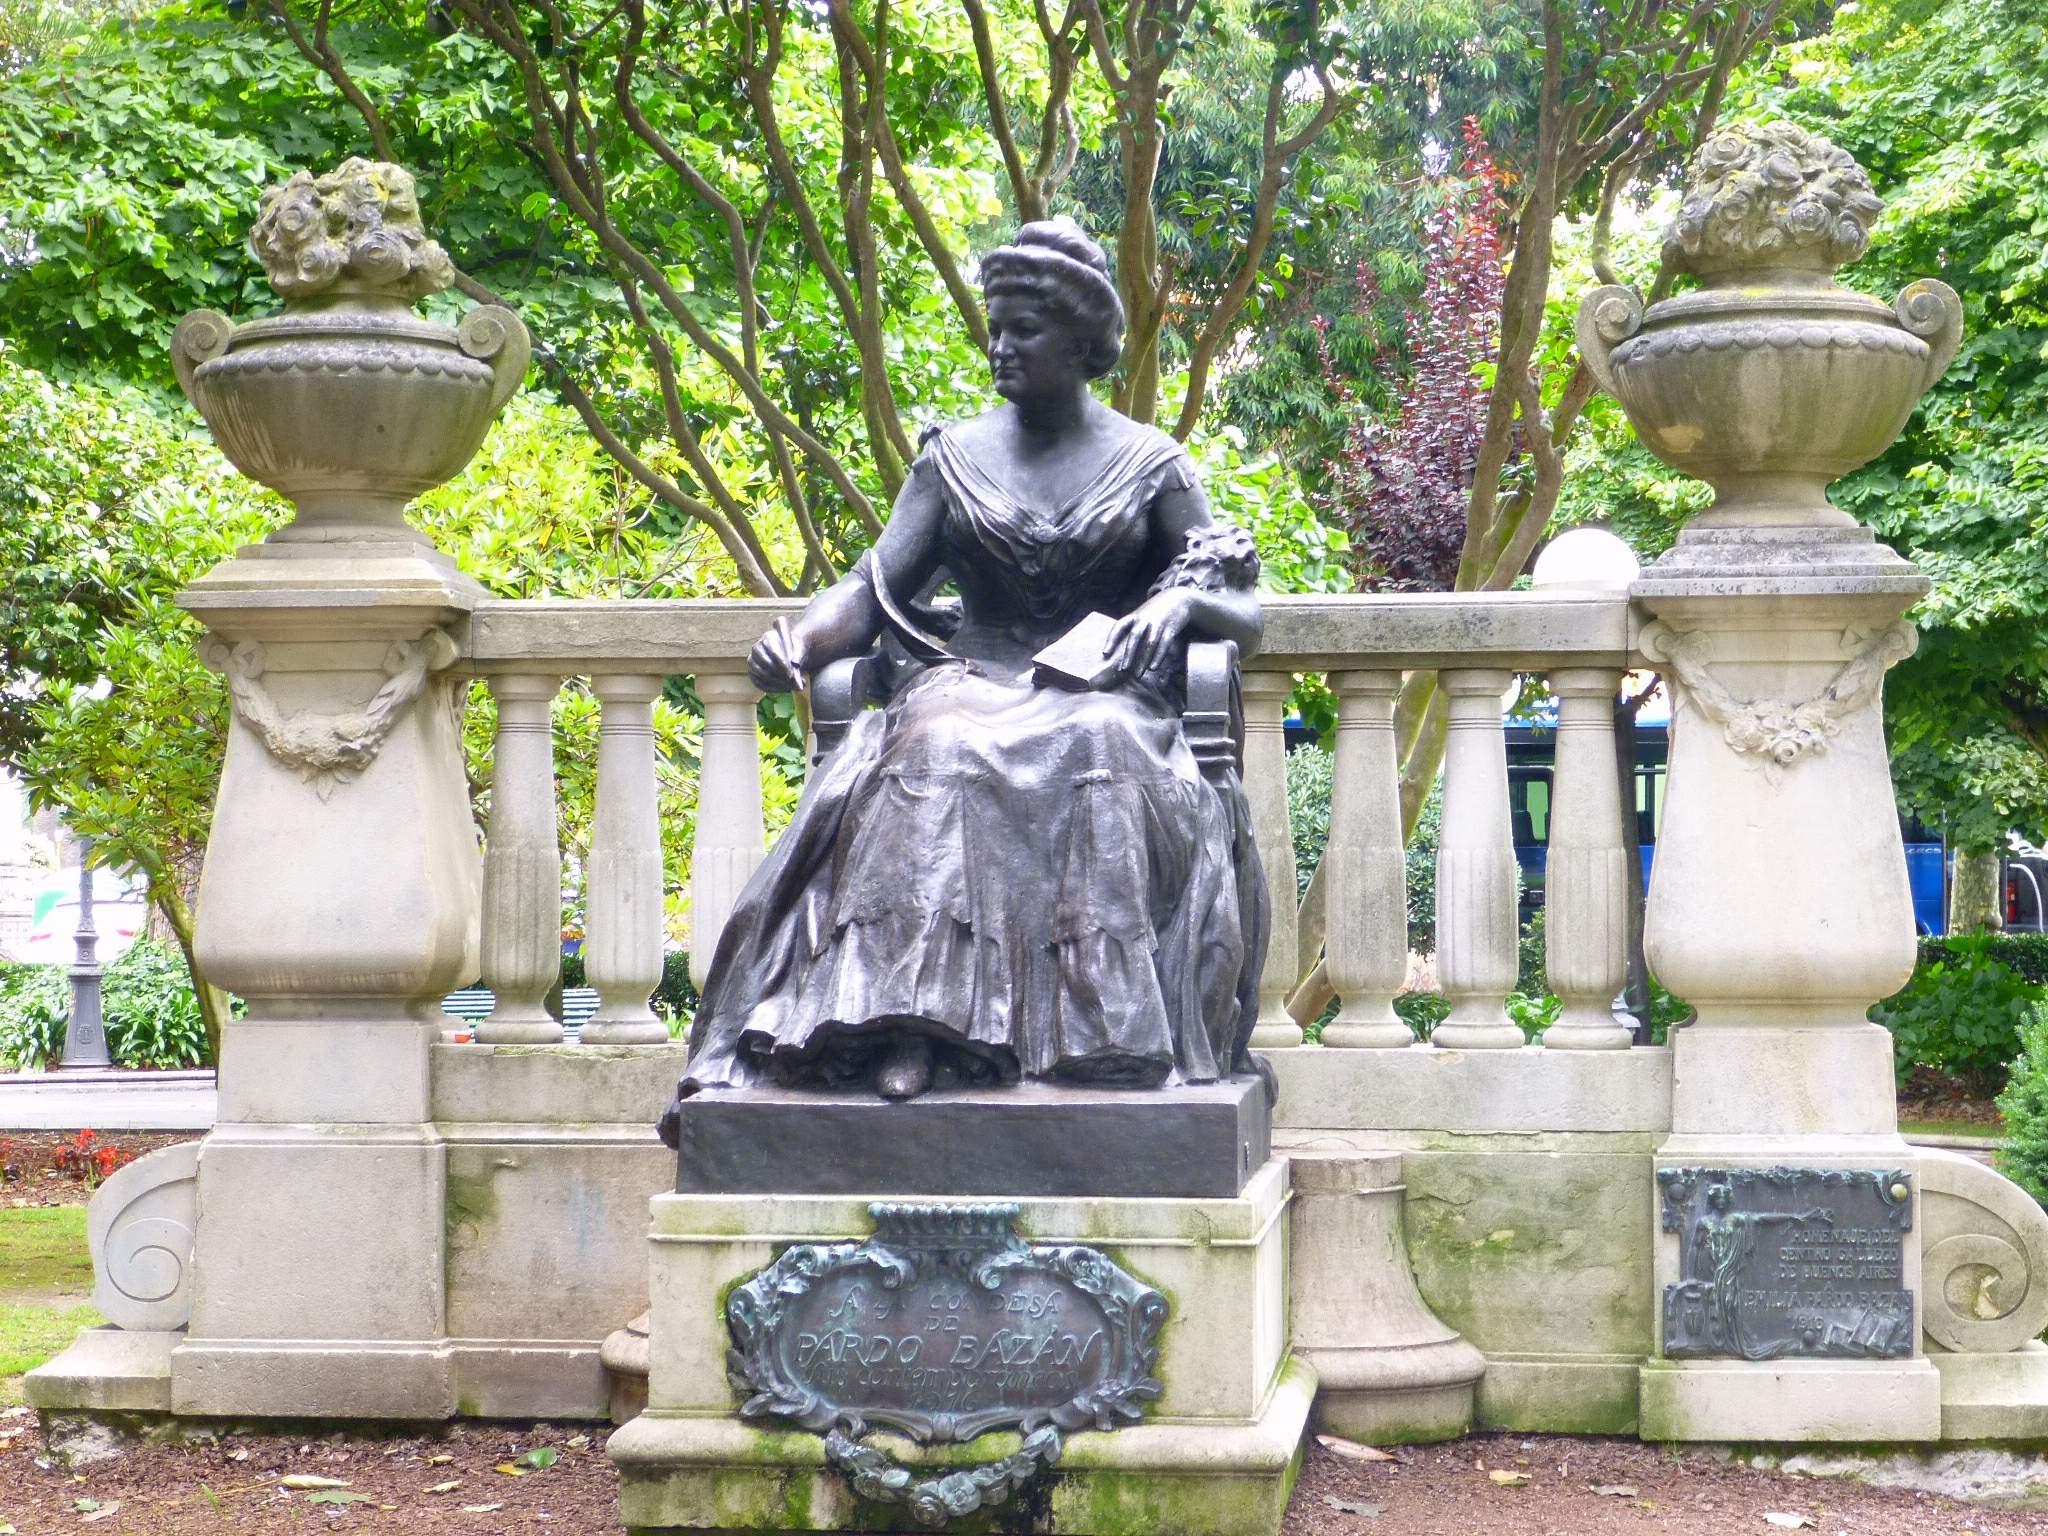 File:A Coruña - Jardín de Méndez Núñez - Monumento a Emilia Pardo Bazán  1.JPG - Wikimedia Commons